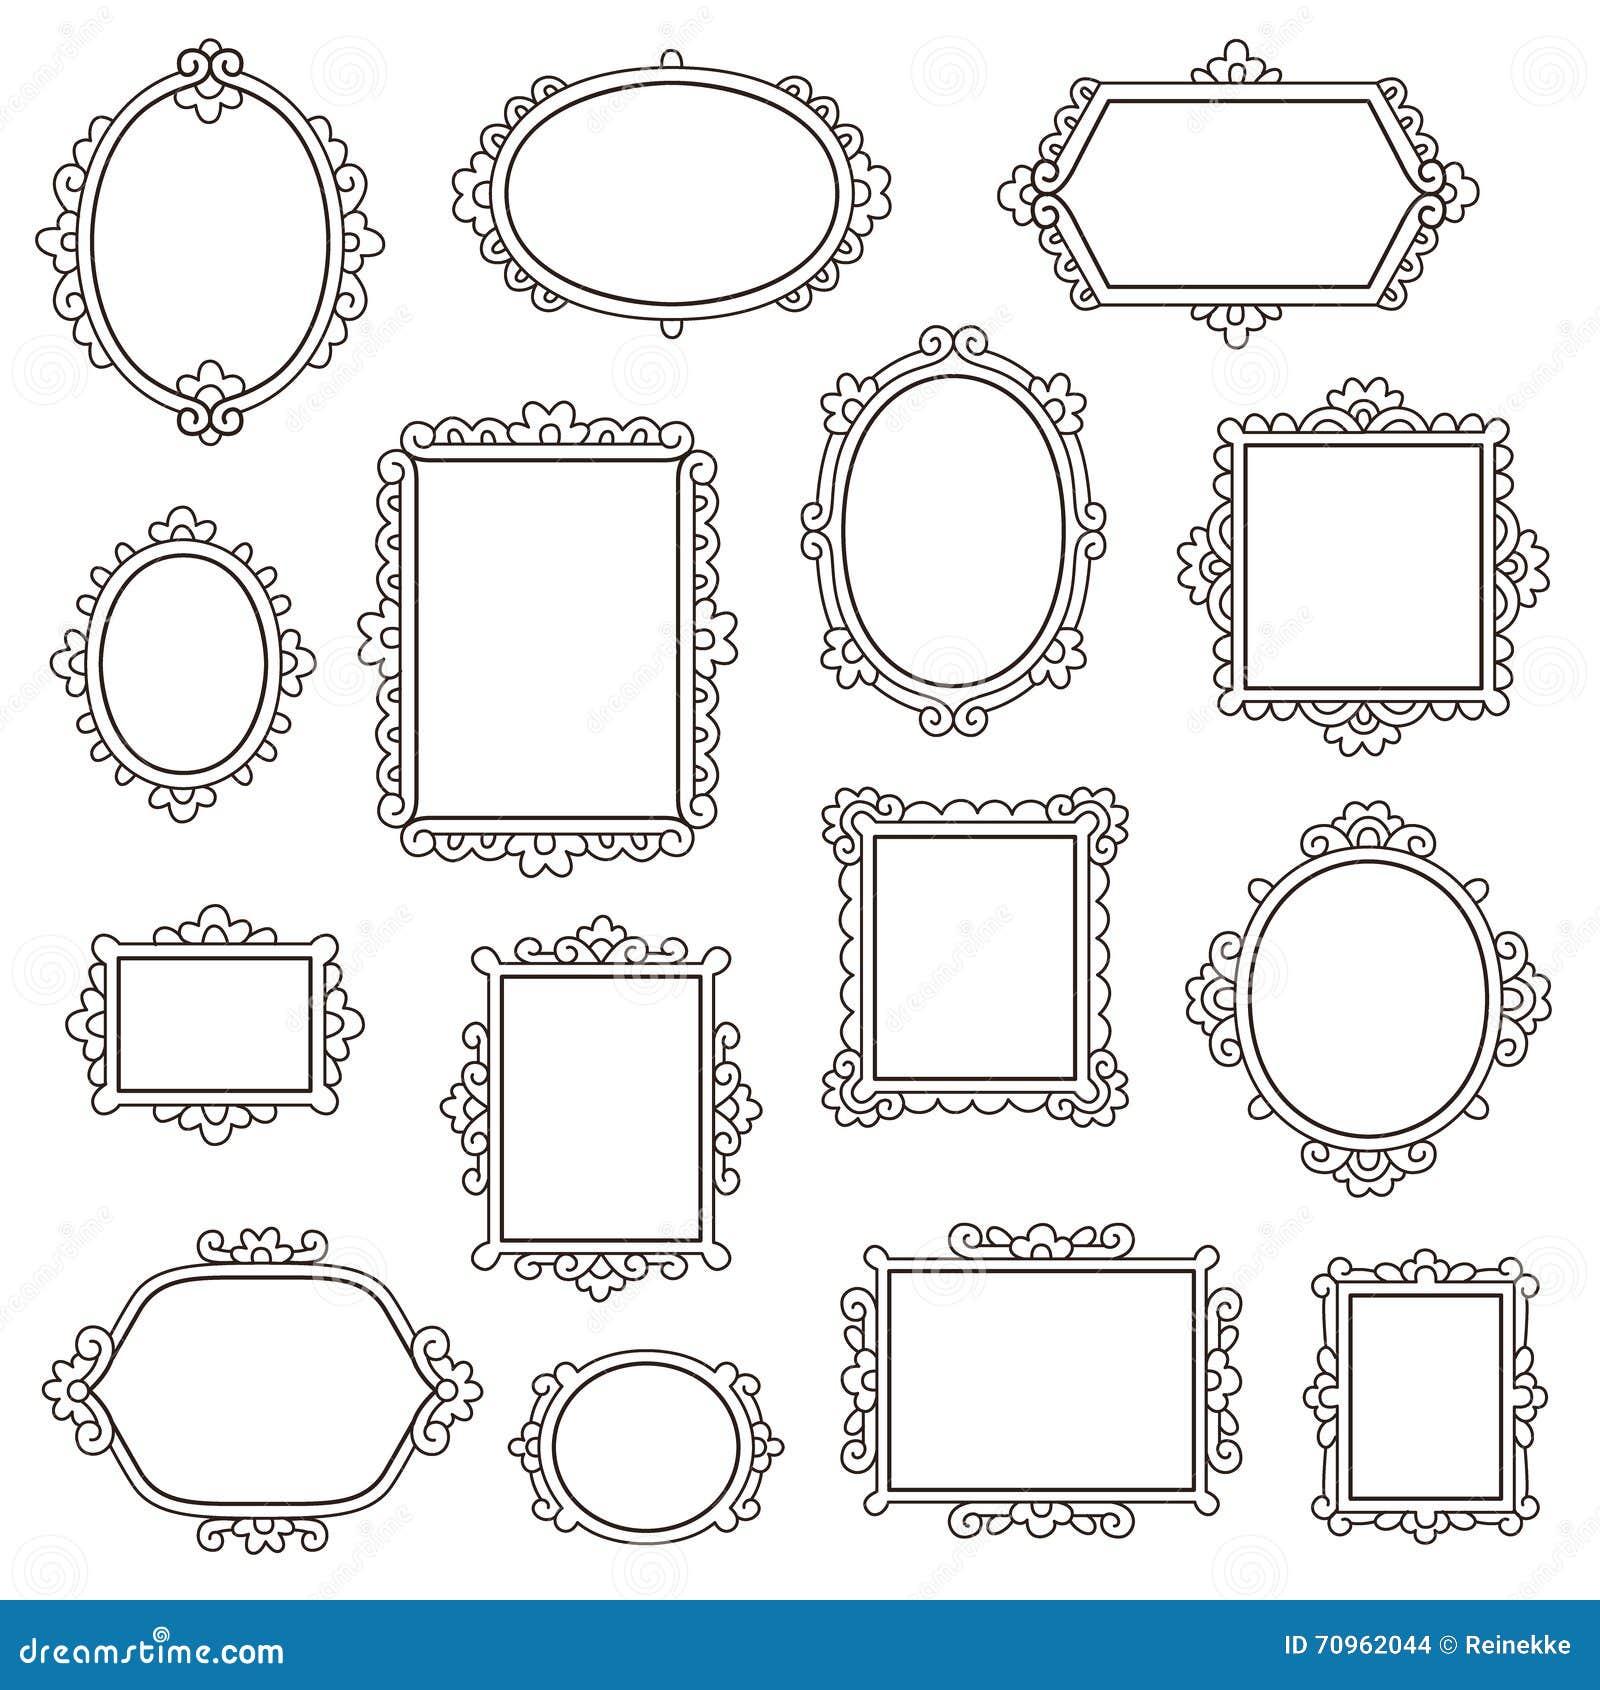 Small vintage frames stock vector. Illustration of elegant - 70962044